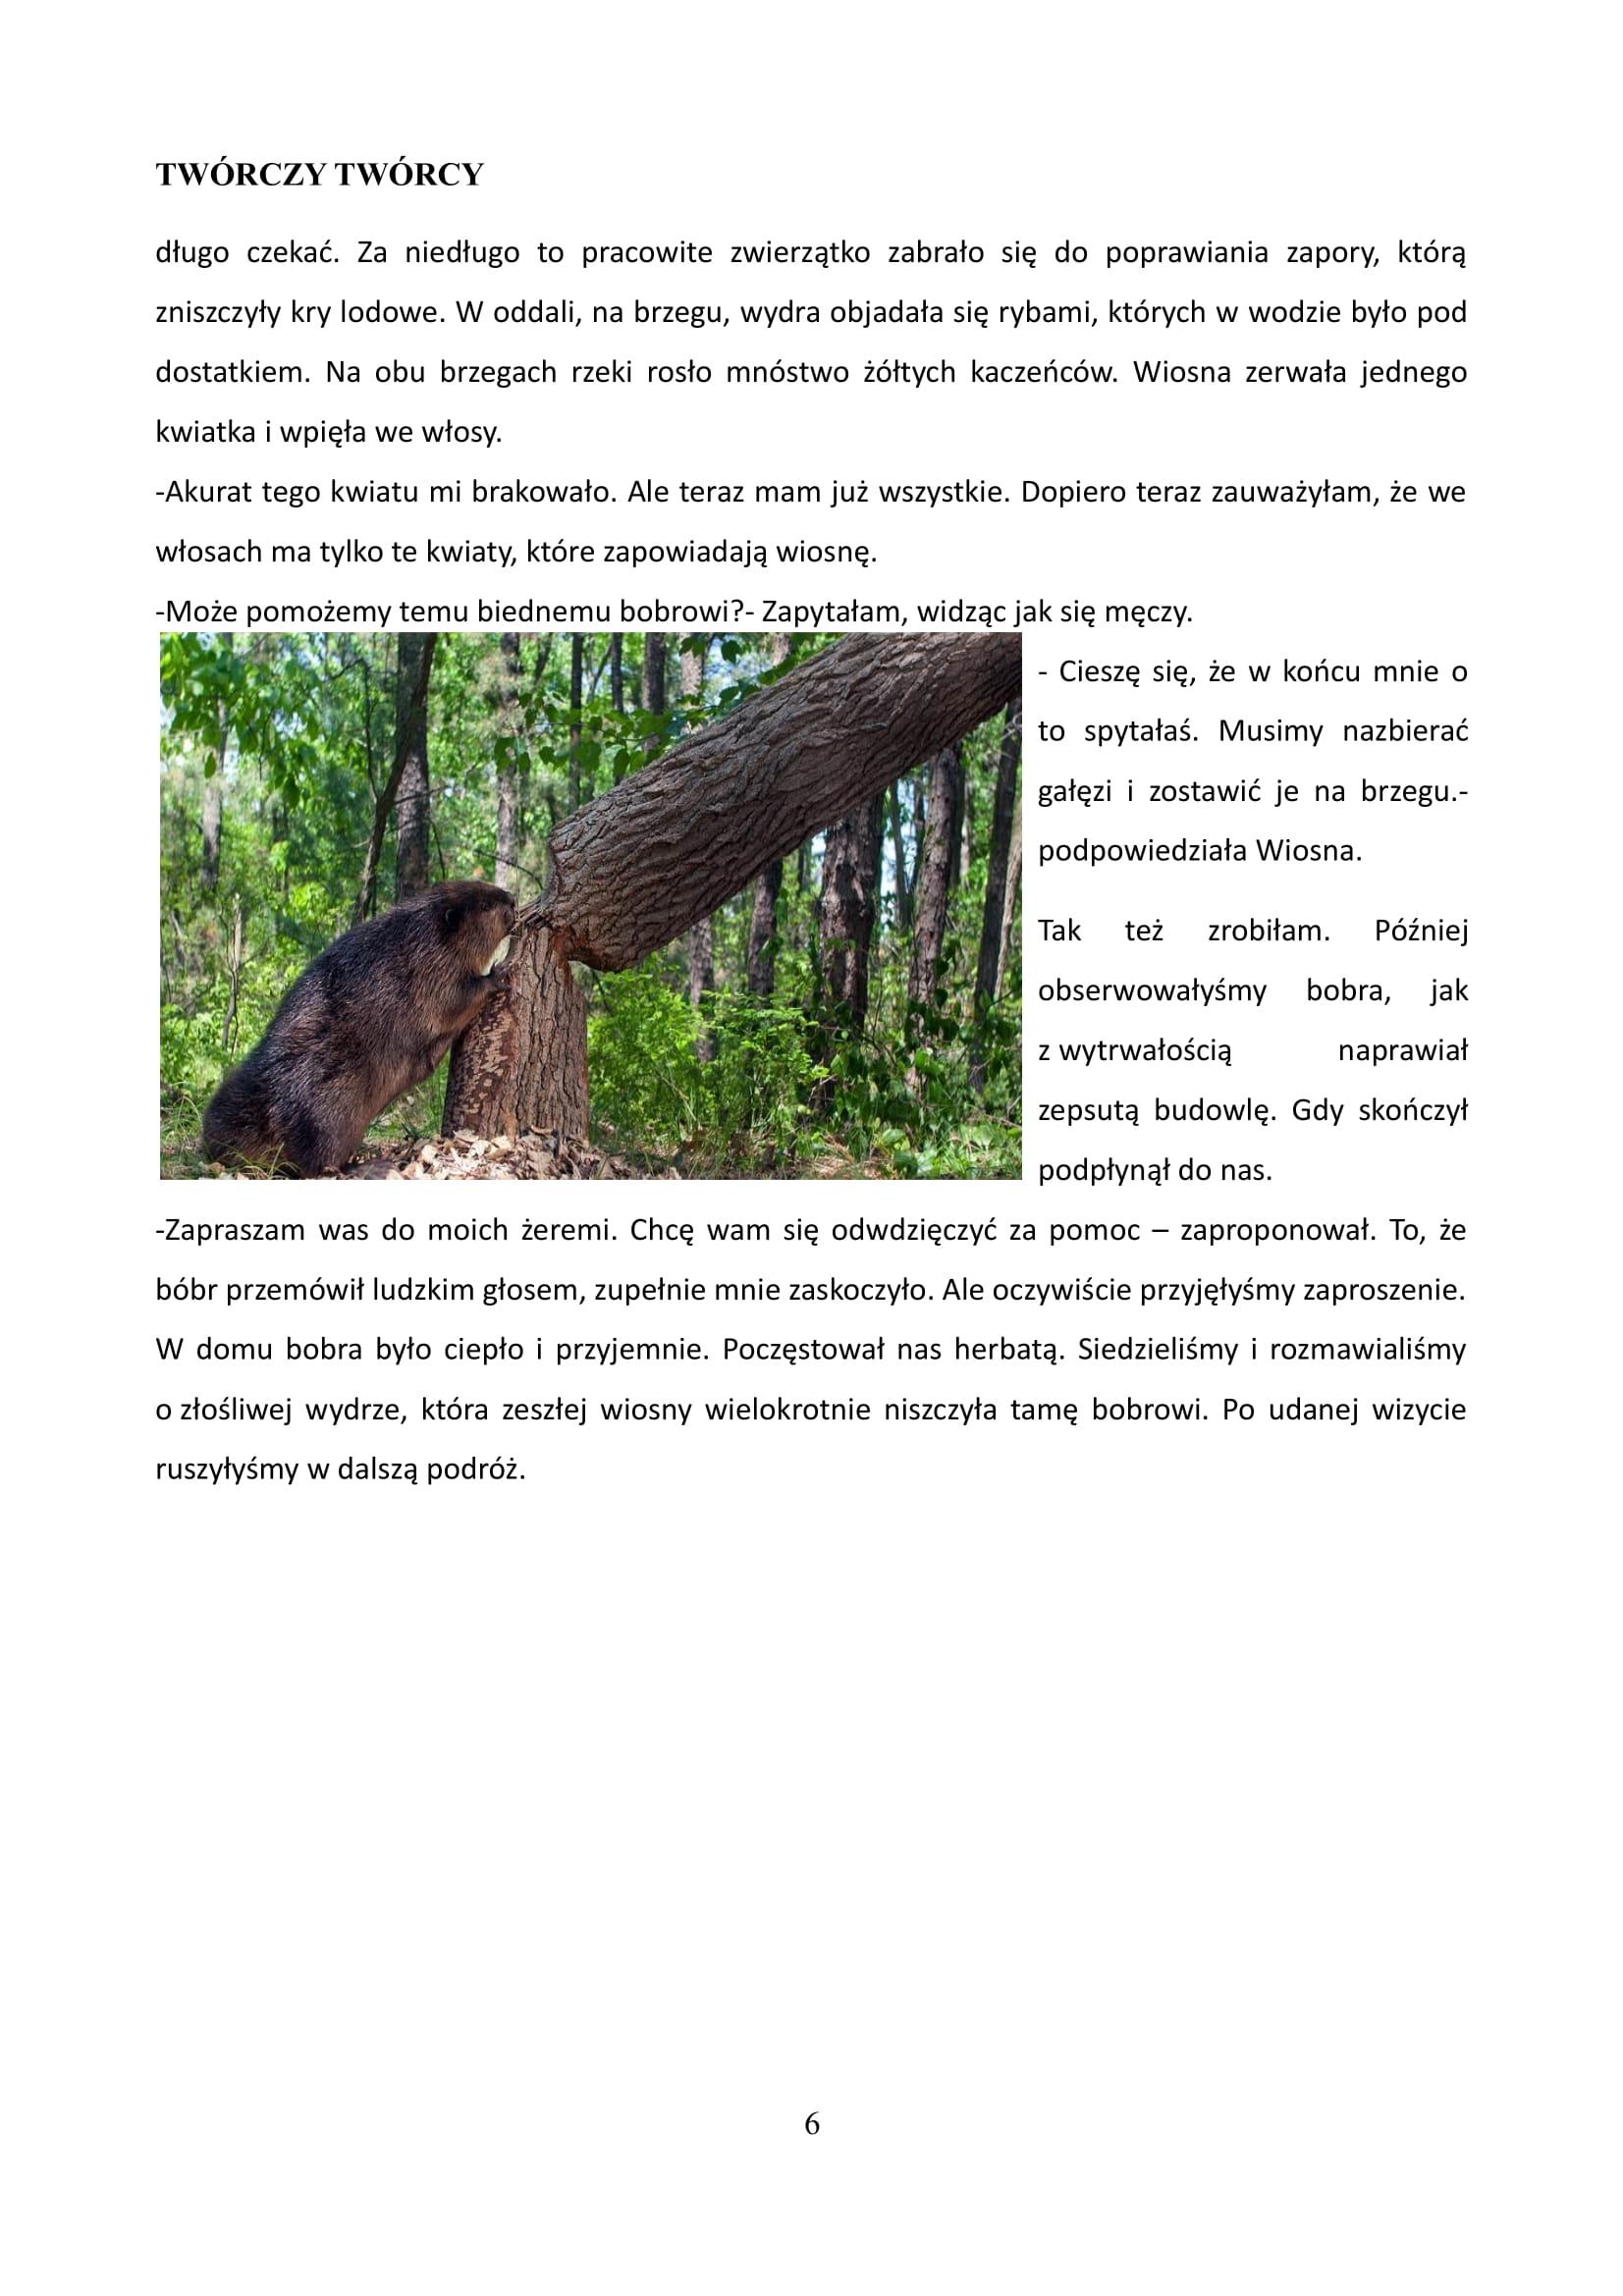 http://sp24sto.edu.pl/wp-content/uploads/sites/3/2018/02/Gazeta-4-2016.2017-06.jpg